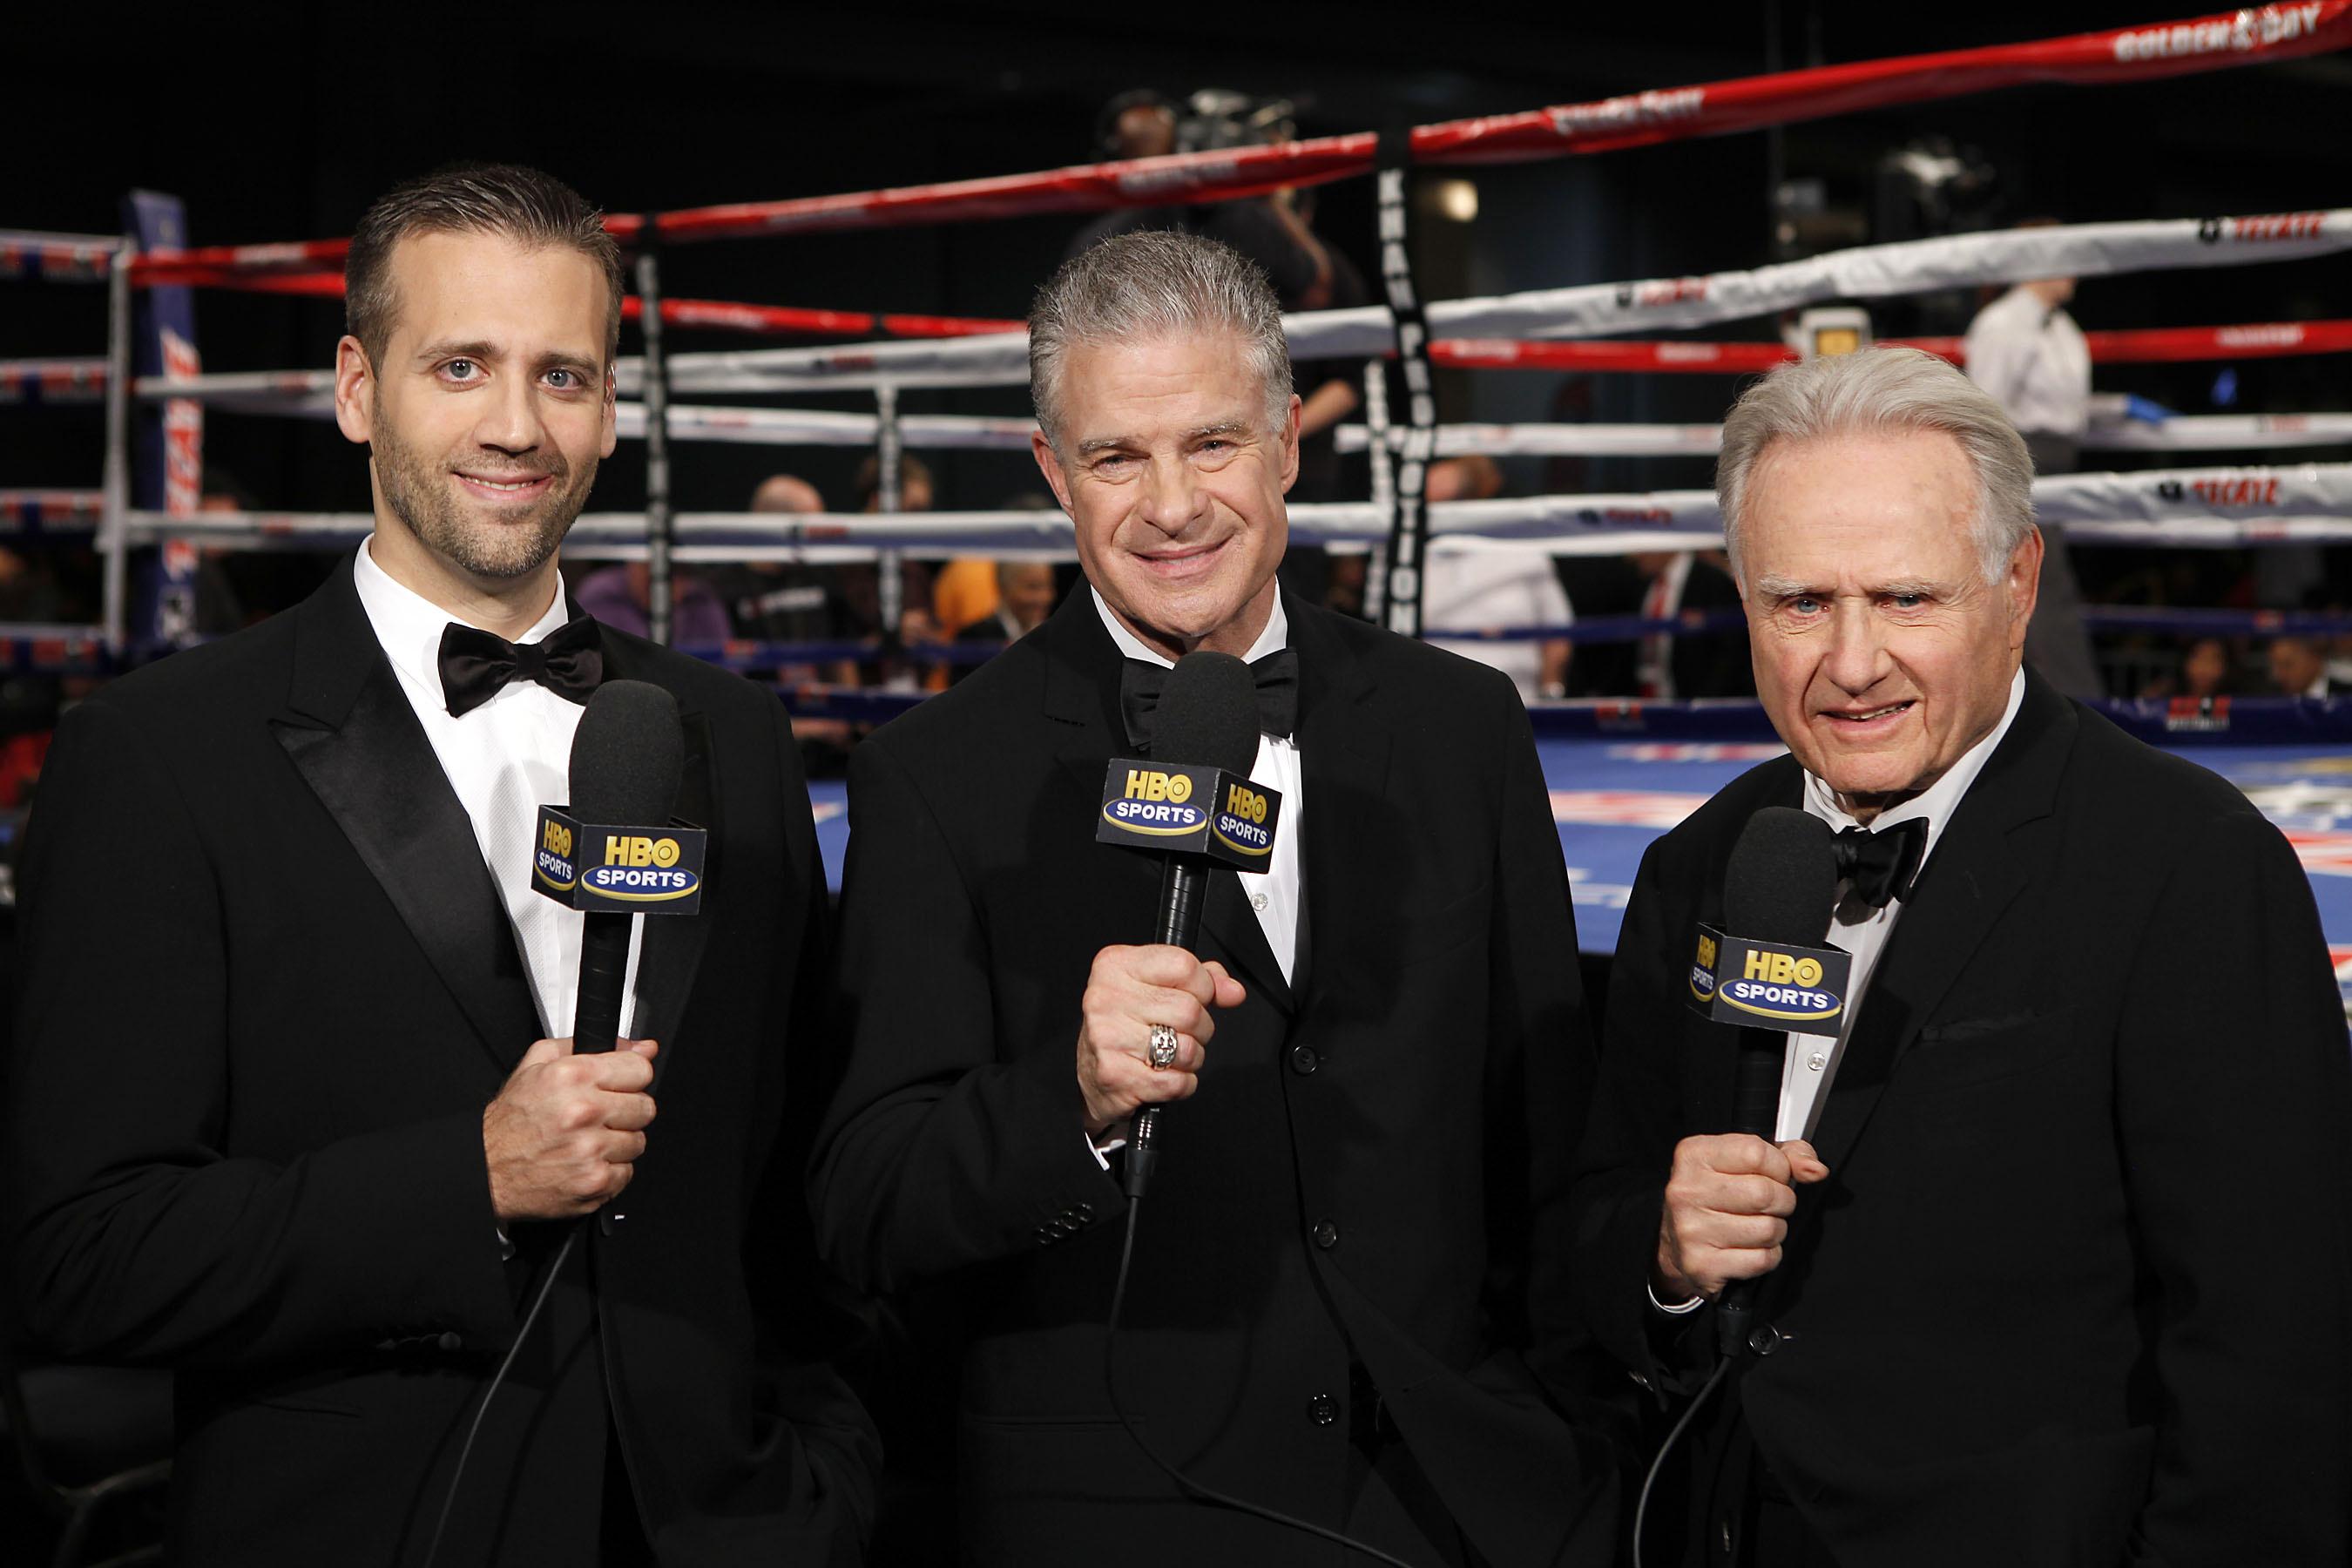 HBO WCB .Max Kellerman, Jim Lampley & Larry Merchant.